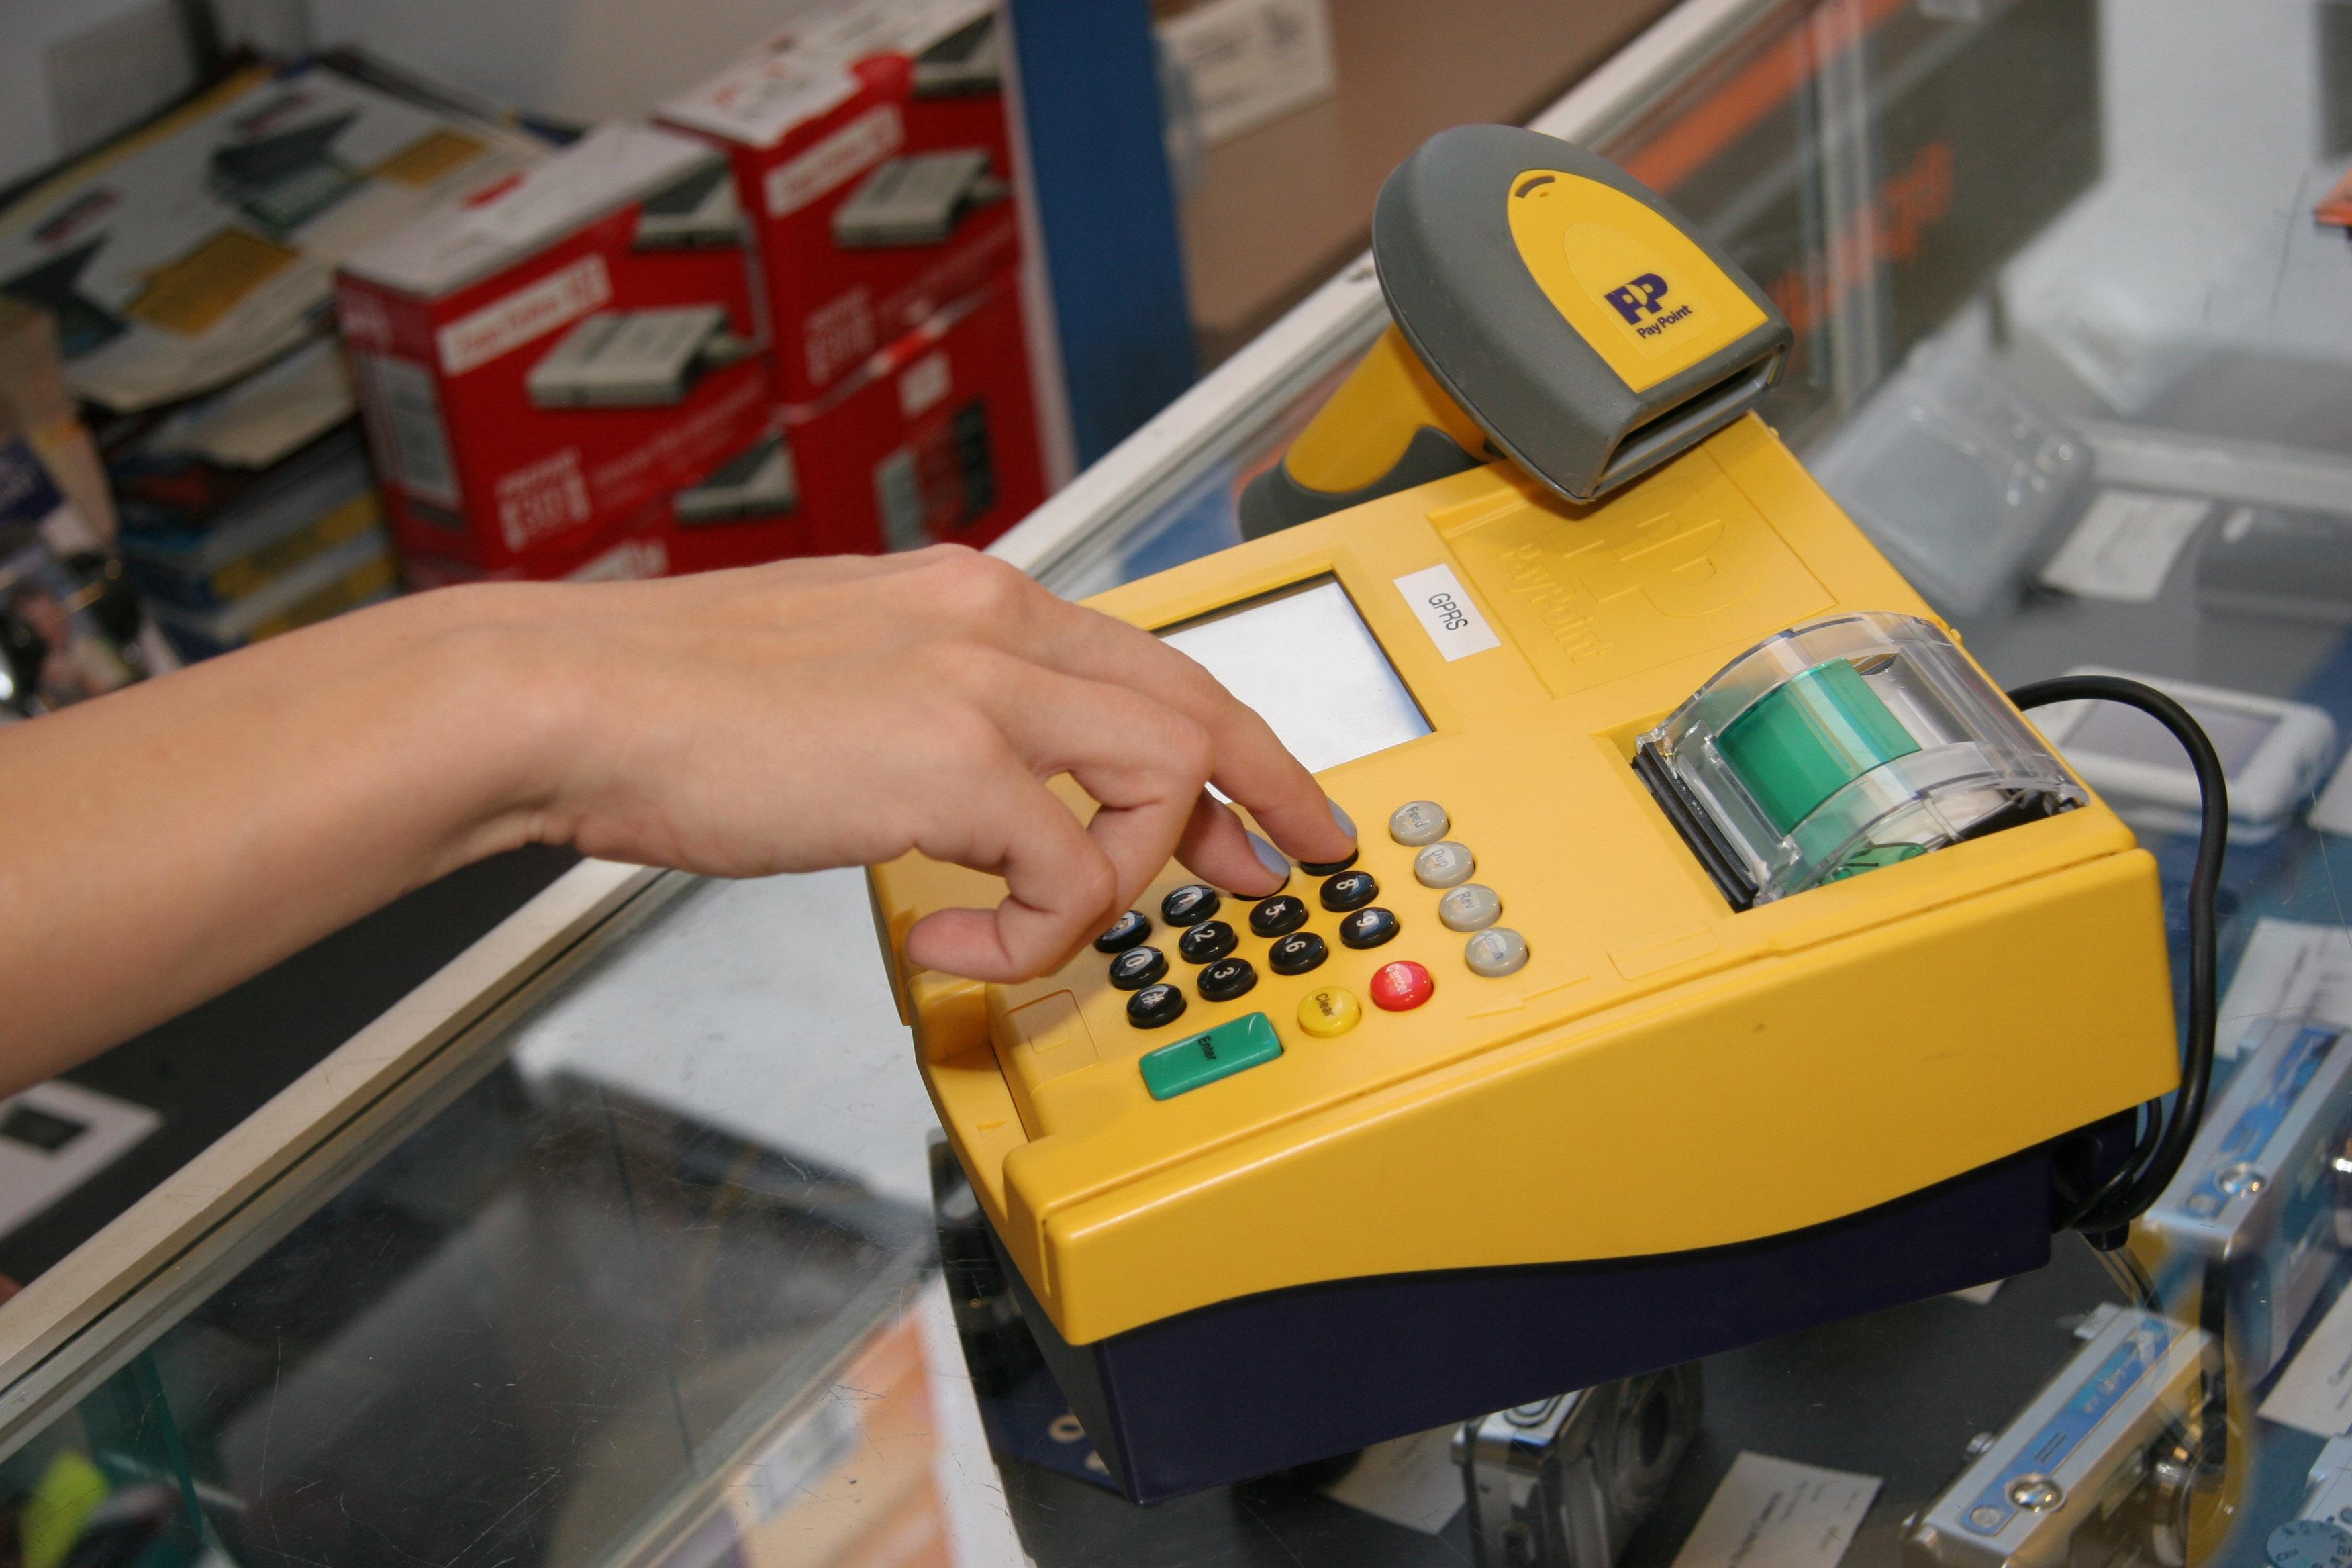 Neosurf brings online prepaid services to Romania through